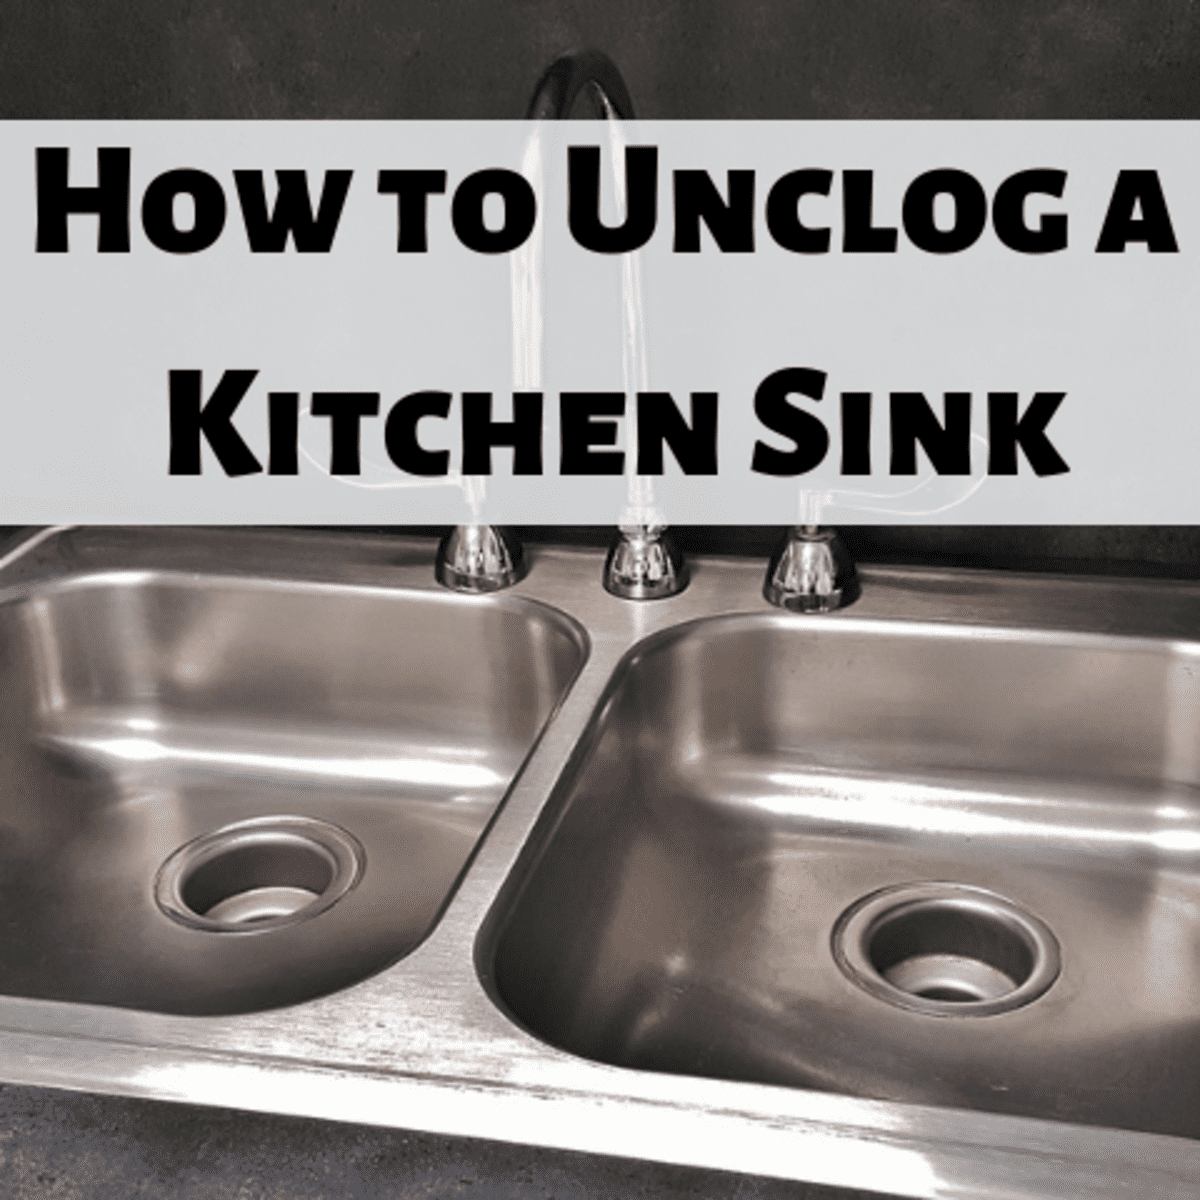 How To Unclog A Kitchen Sink Drain 8 Methods Dengarden